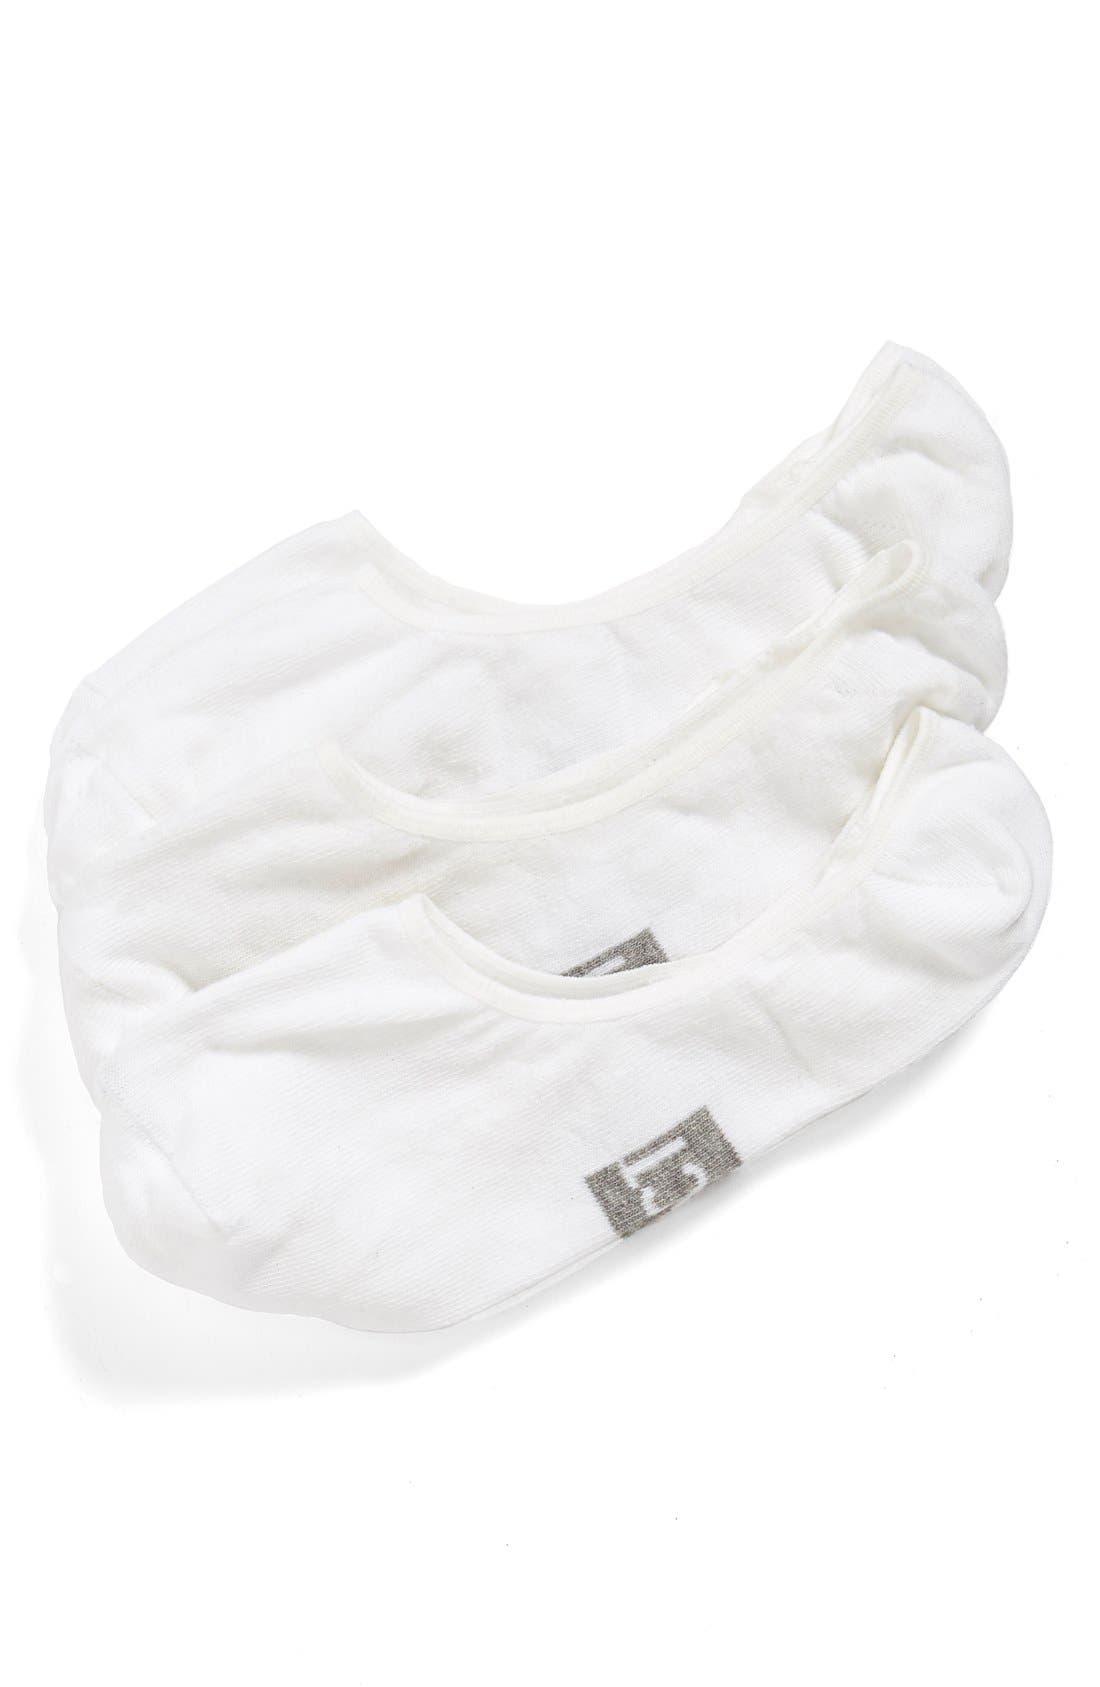 Main Image - PACT Organic Cotton No-Show Socks (3-Pack)